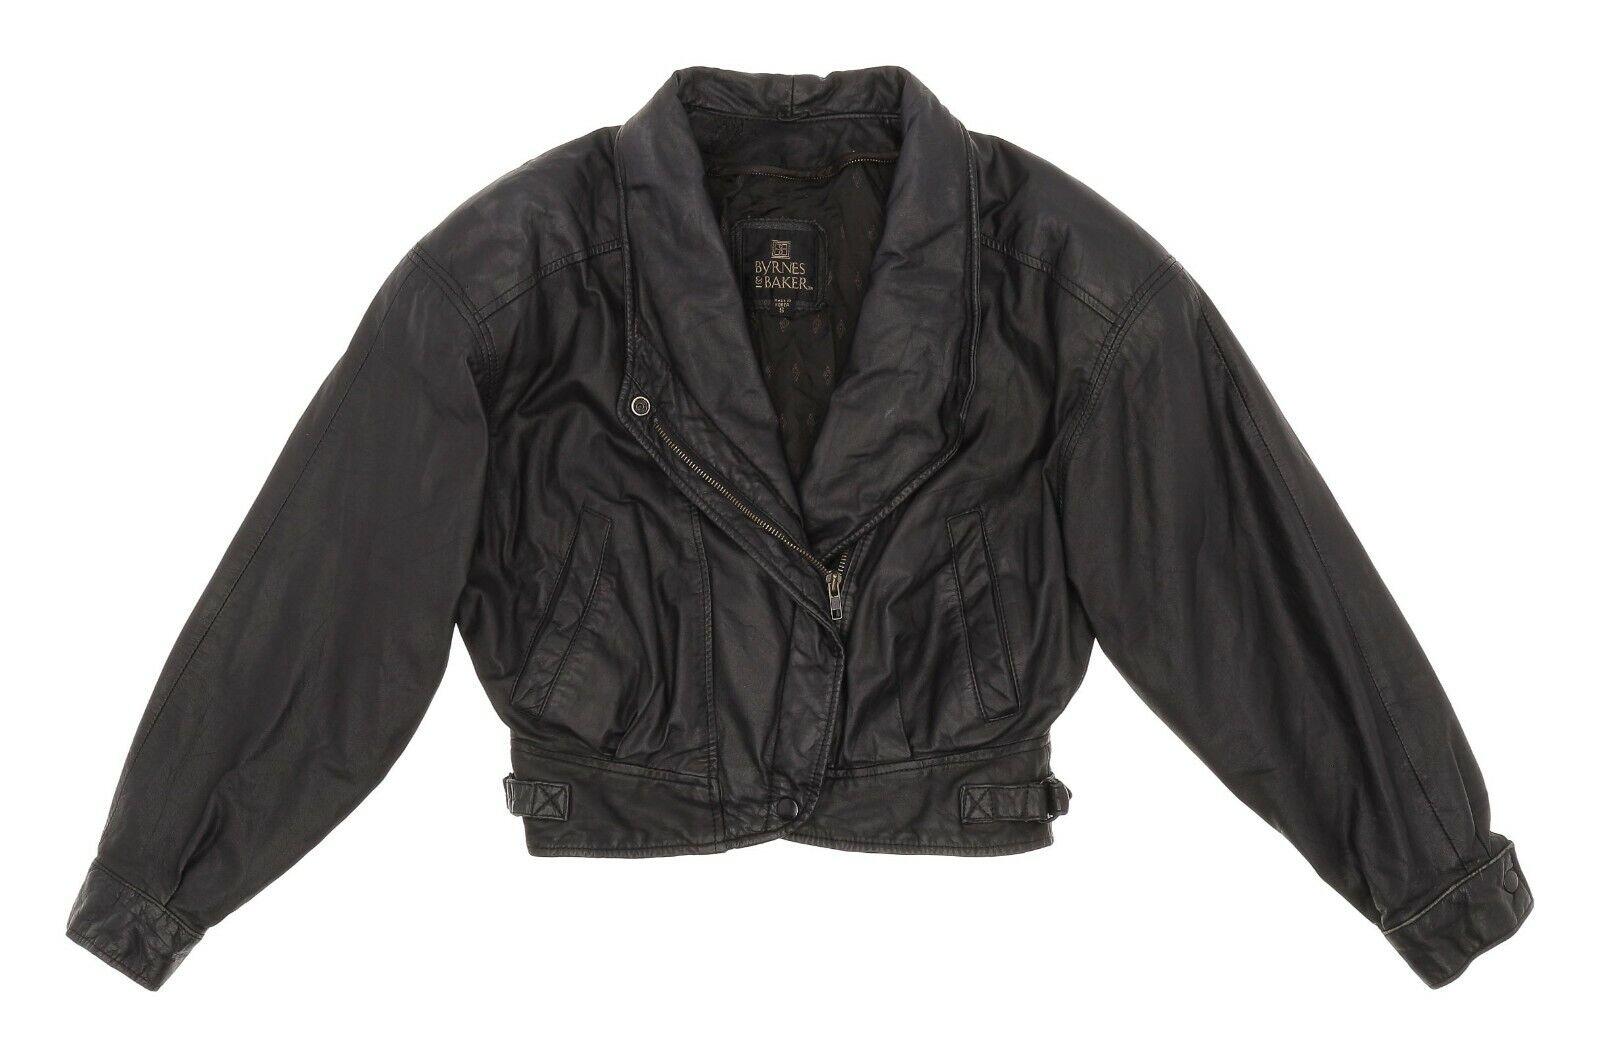 Vintage BYRNES BAKER Leather Jacket S Small Womens Vtg Cropped Motorcycle Jacket